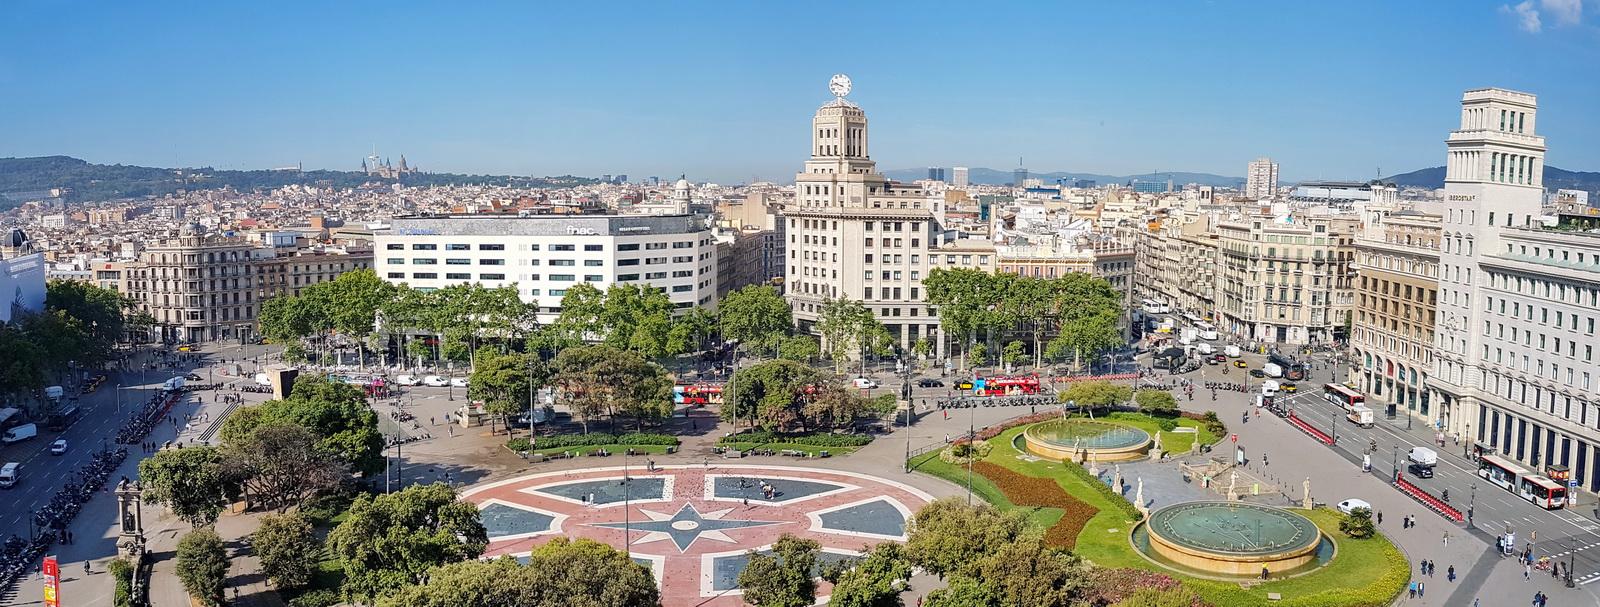 Barcelone-2019-03_redimensionner